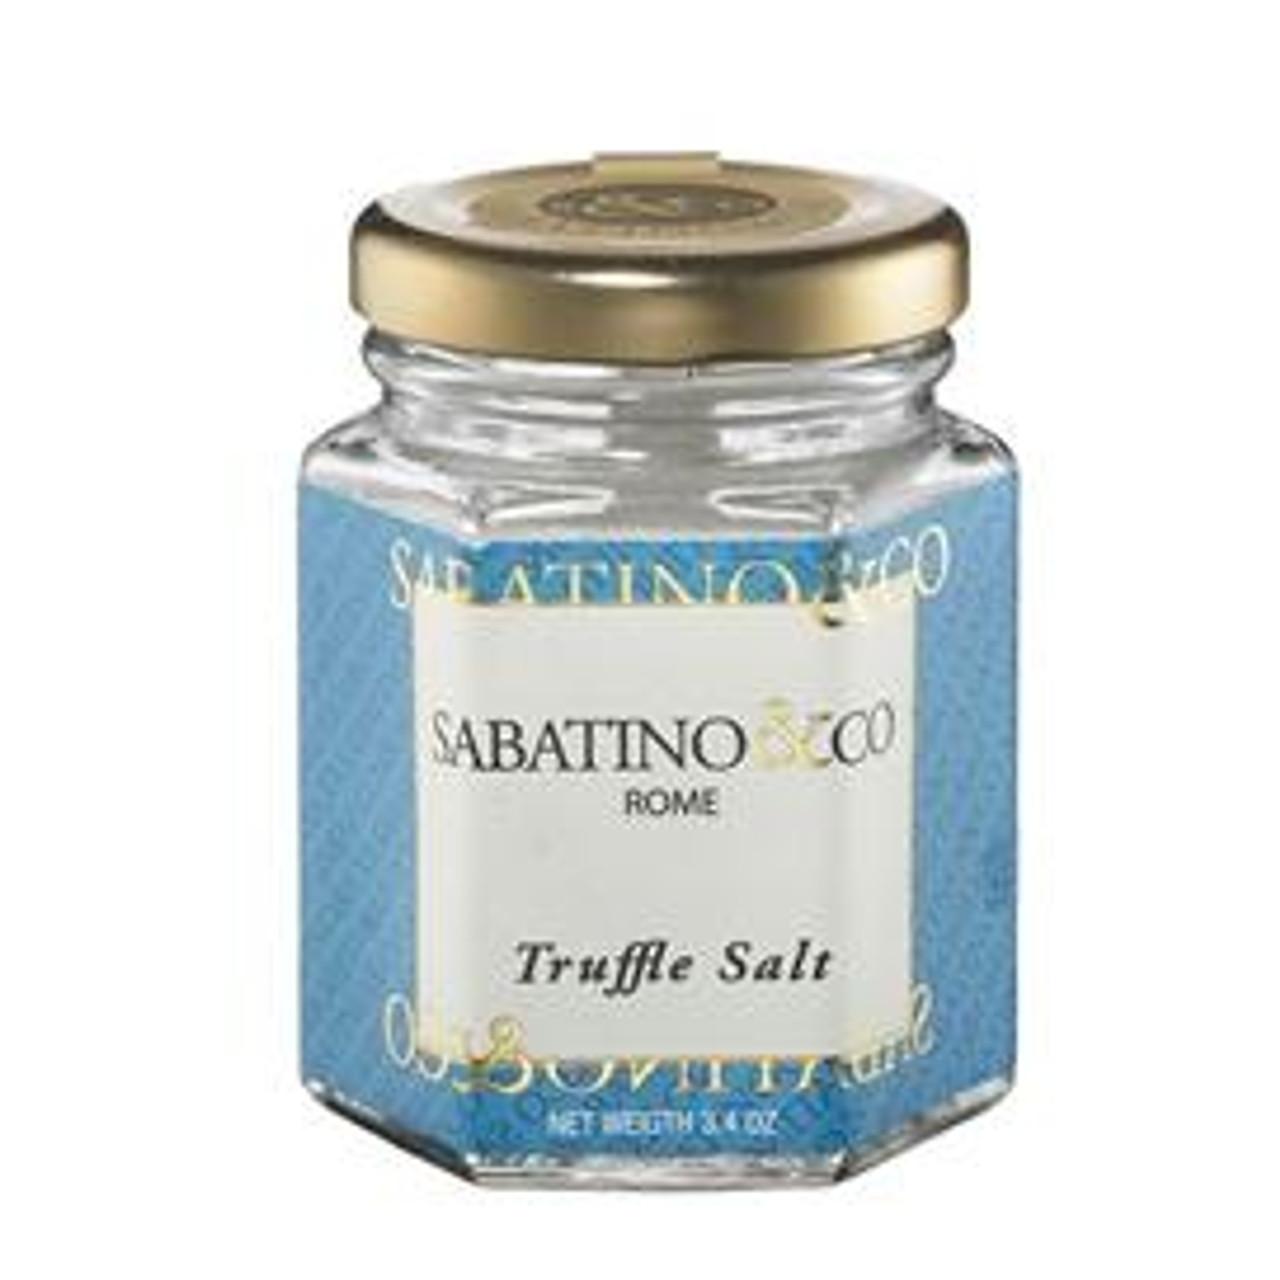 Sabatino Tartufi Truffled Sea Salt